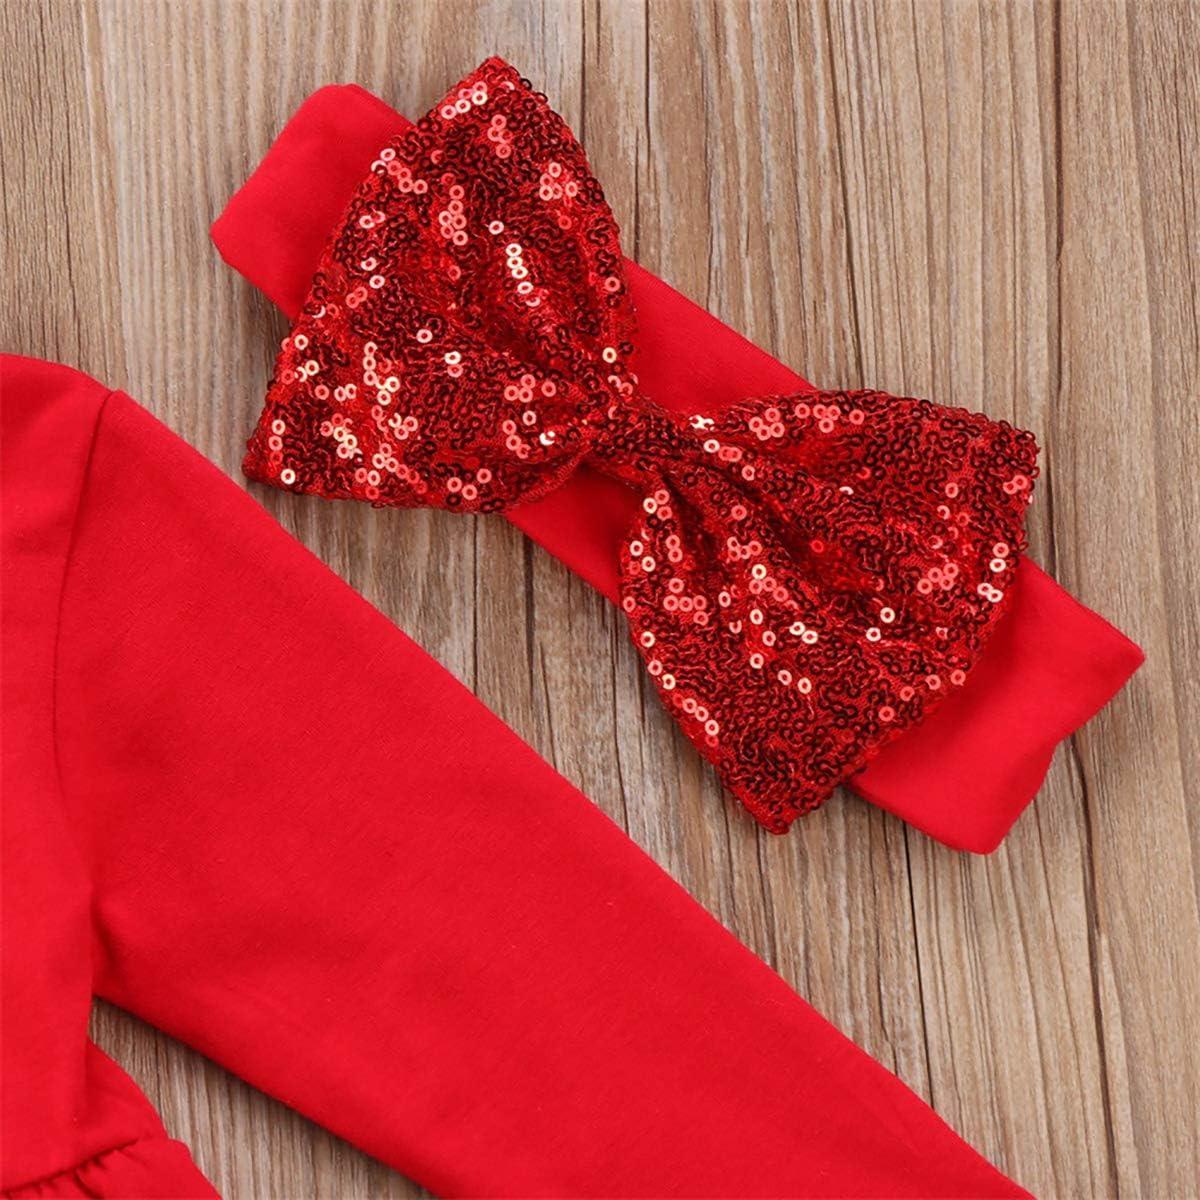 Toddler Baby Girl Outfit Set Kids Princess Dress Pants Clothes Skirt Ruffle with Headband